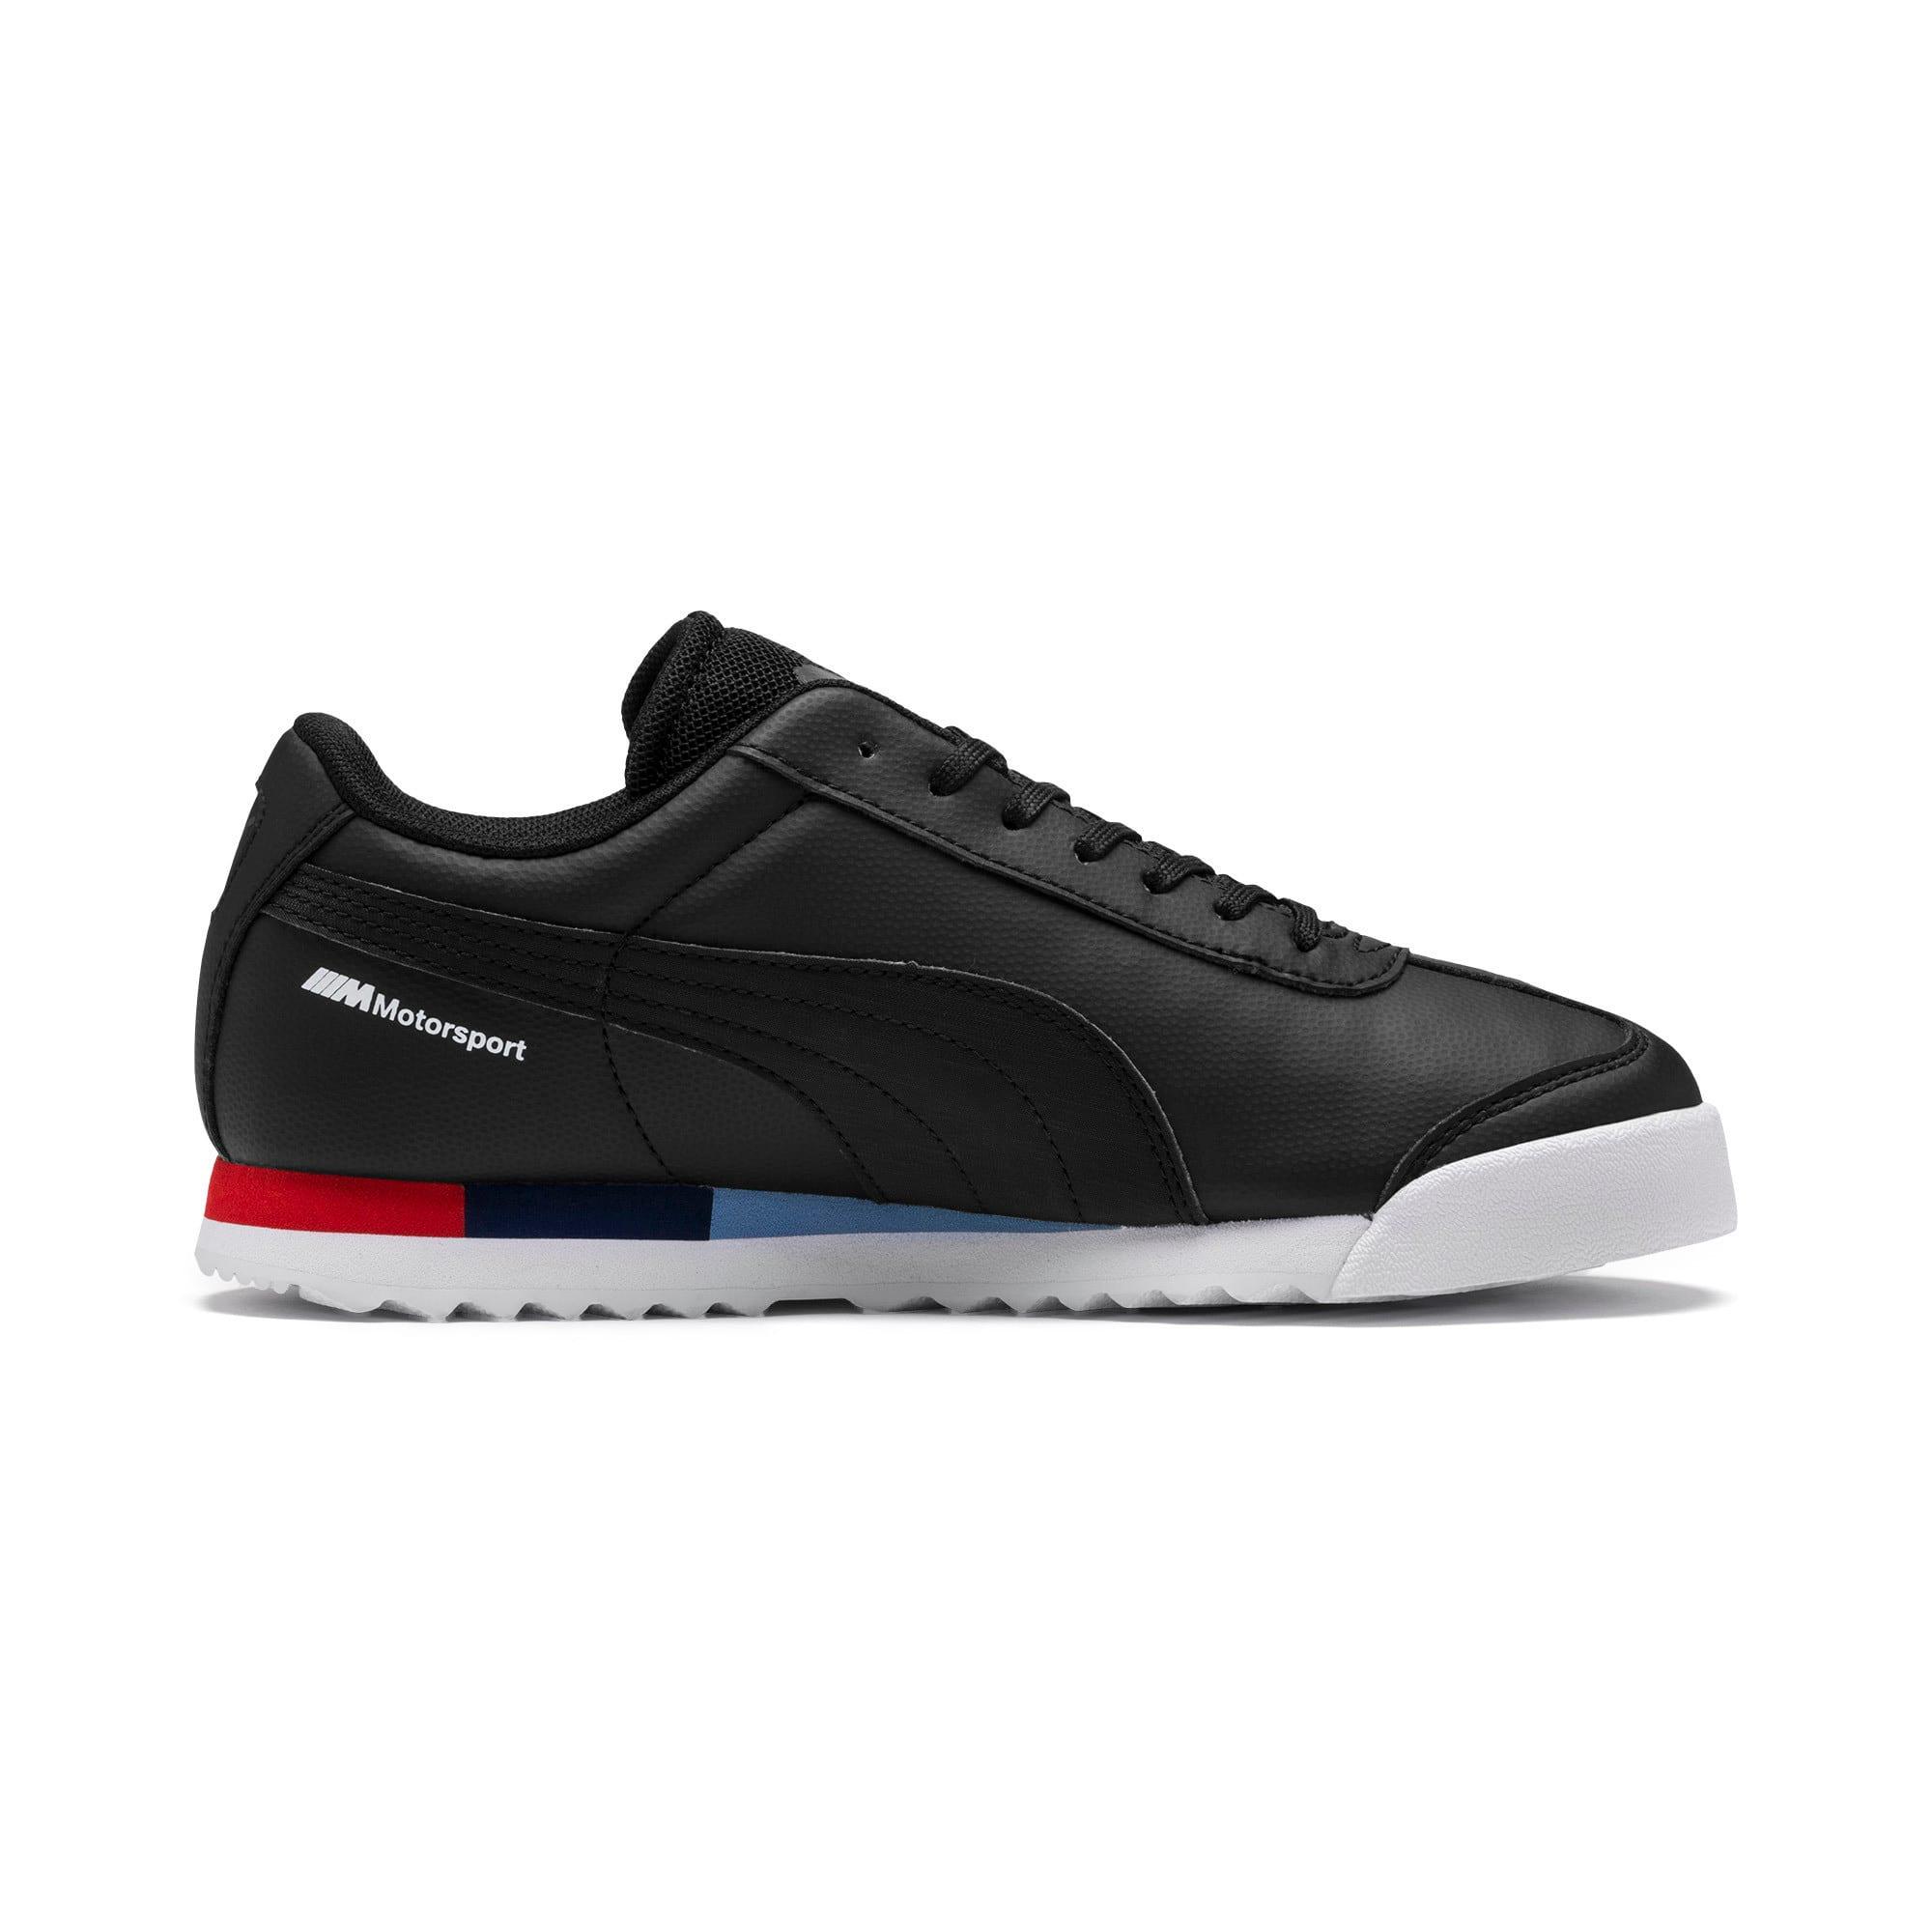 Thumbnail 5 of BMW M Motorsport Roma Sneakers JR, Puma Black-Puma Black, medium